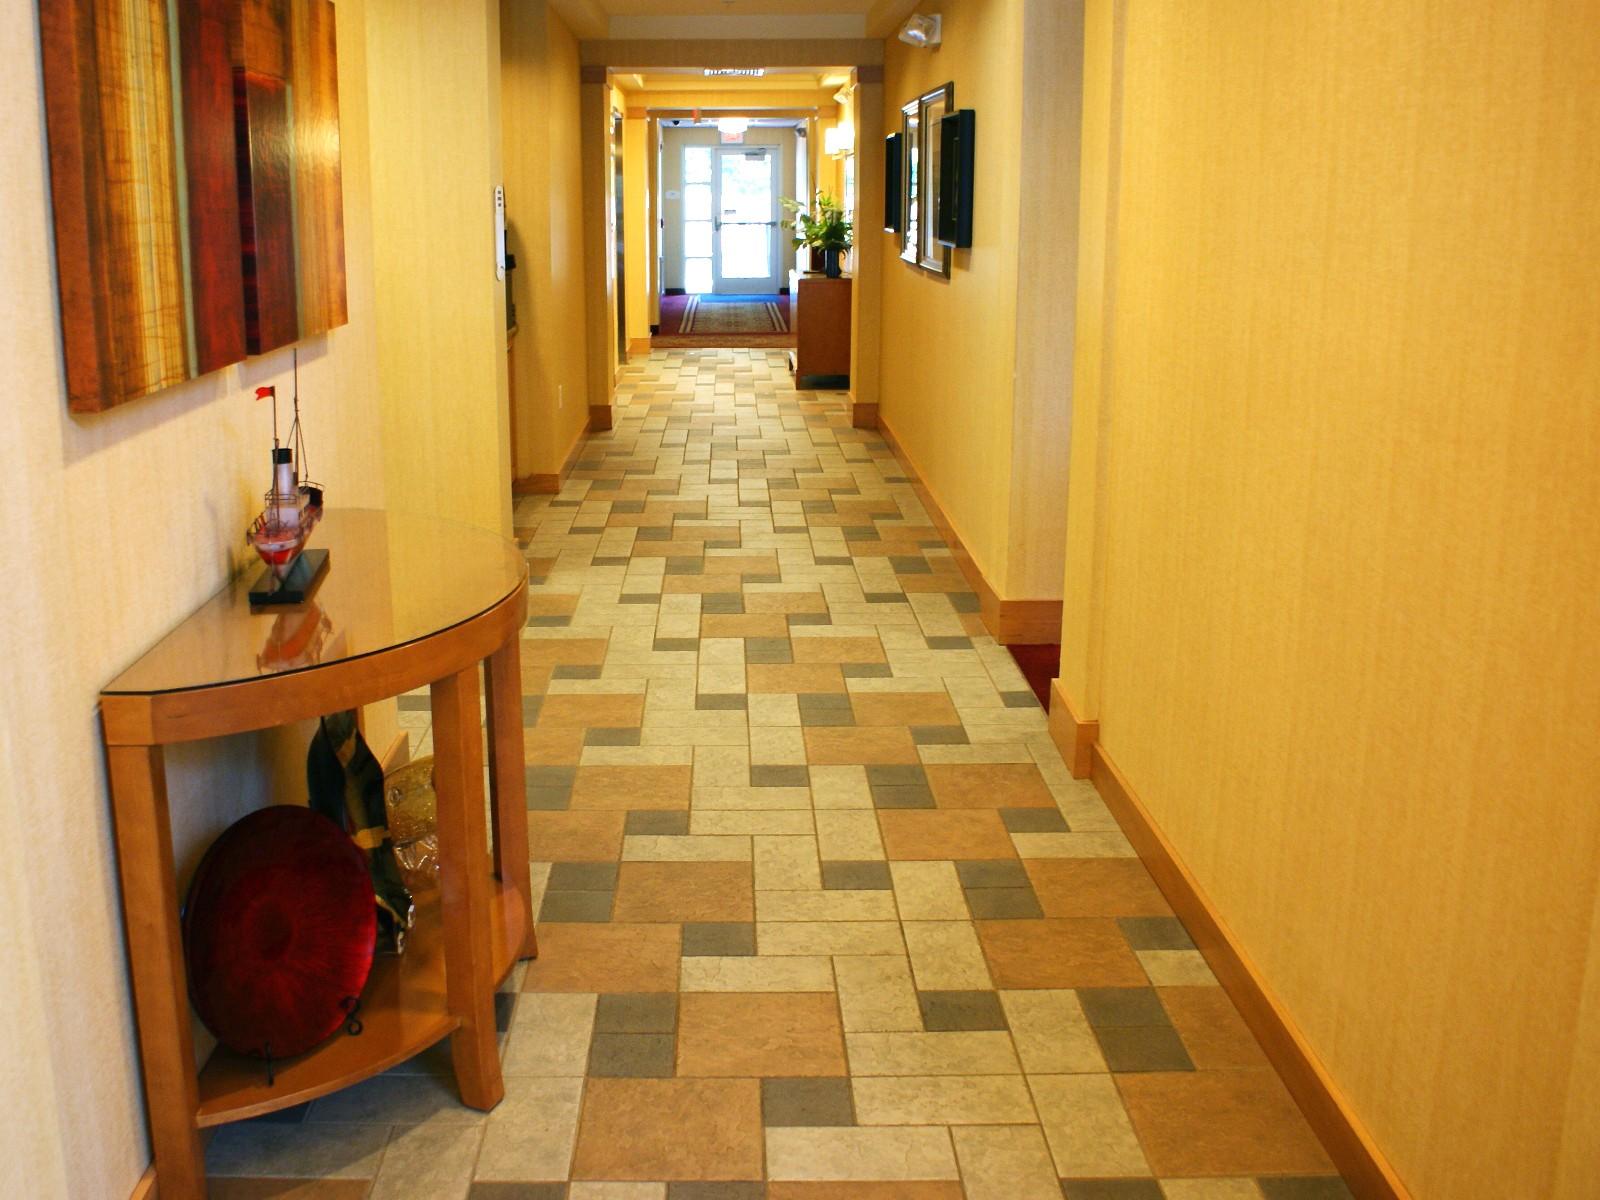 Hampton Inn & Suites| Flooring Installation System